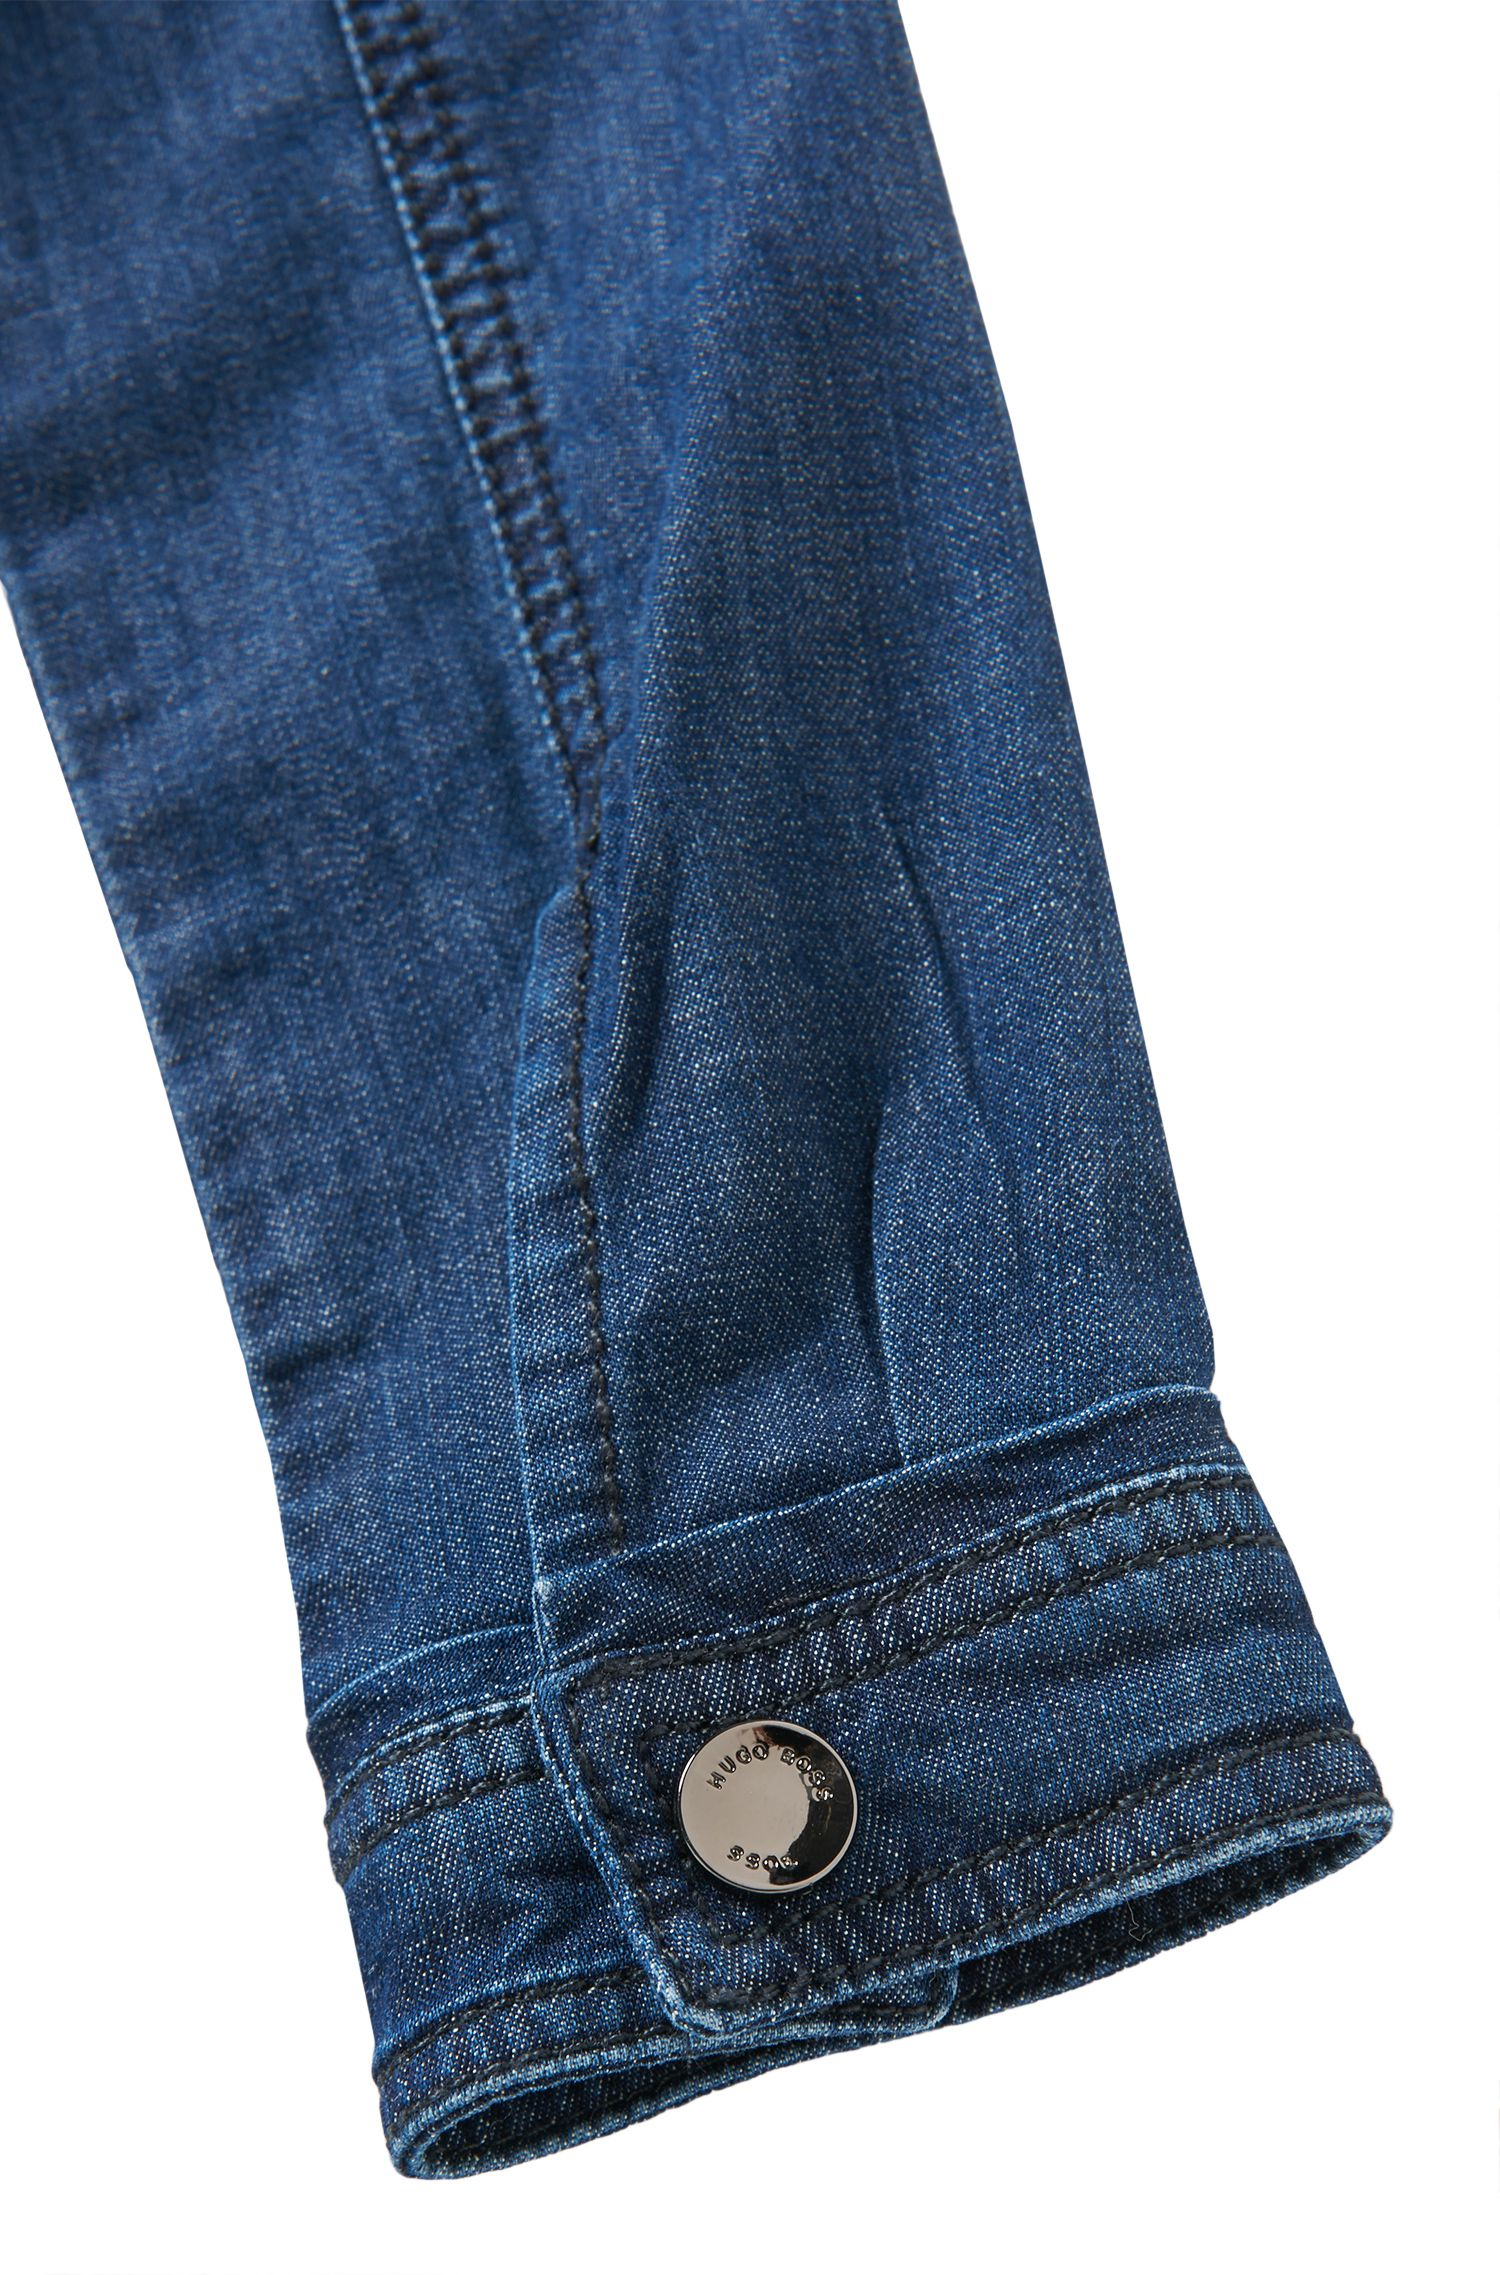 Kids-Jeanskleid aus Stretch-Baumwolle: 'J12127'